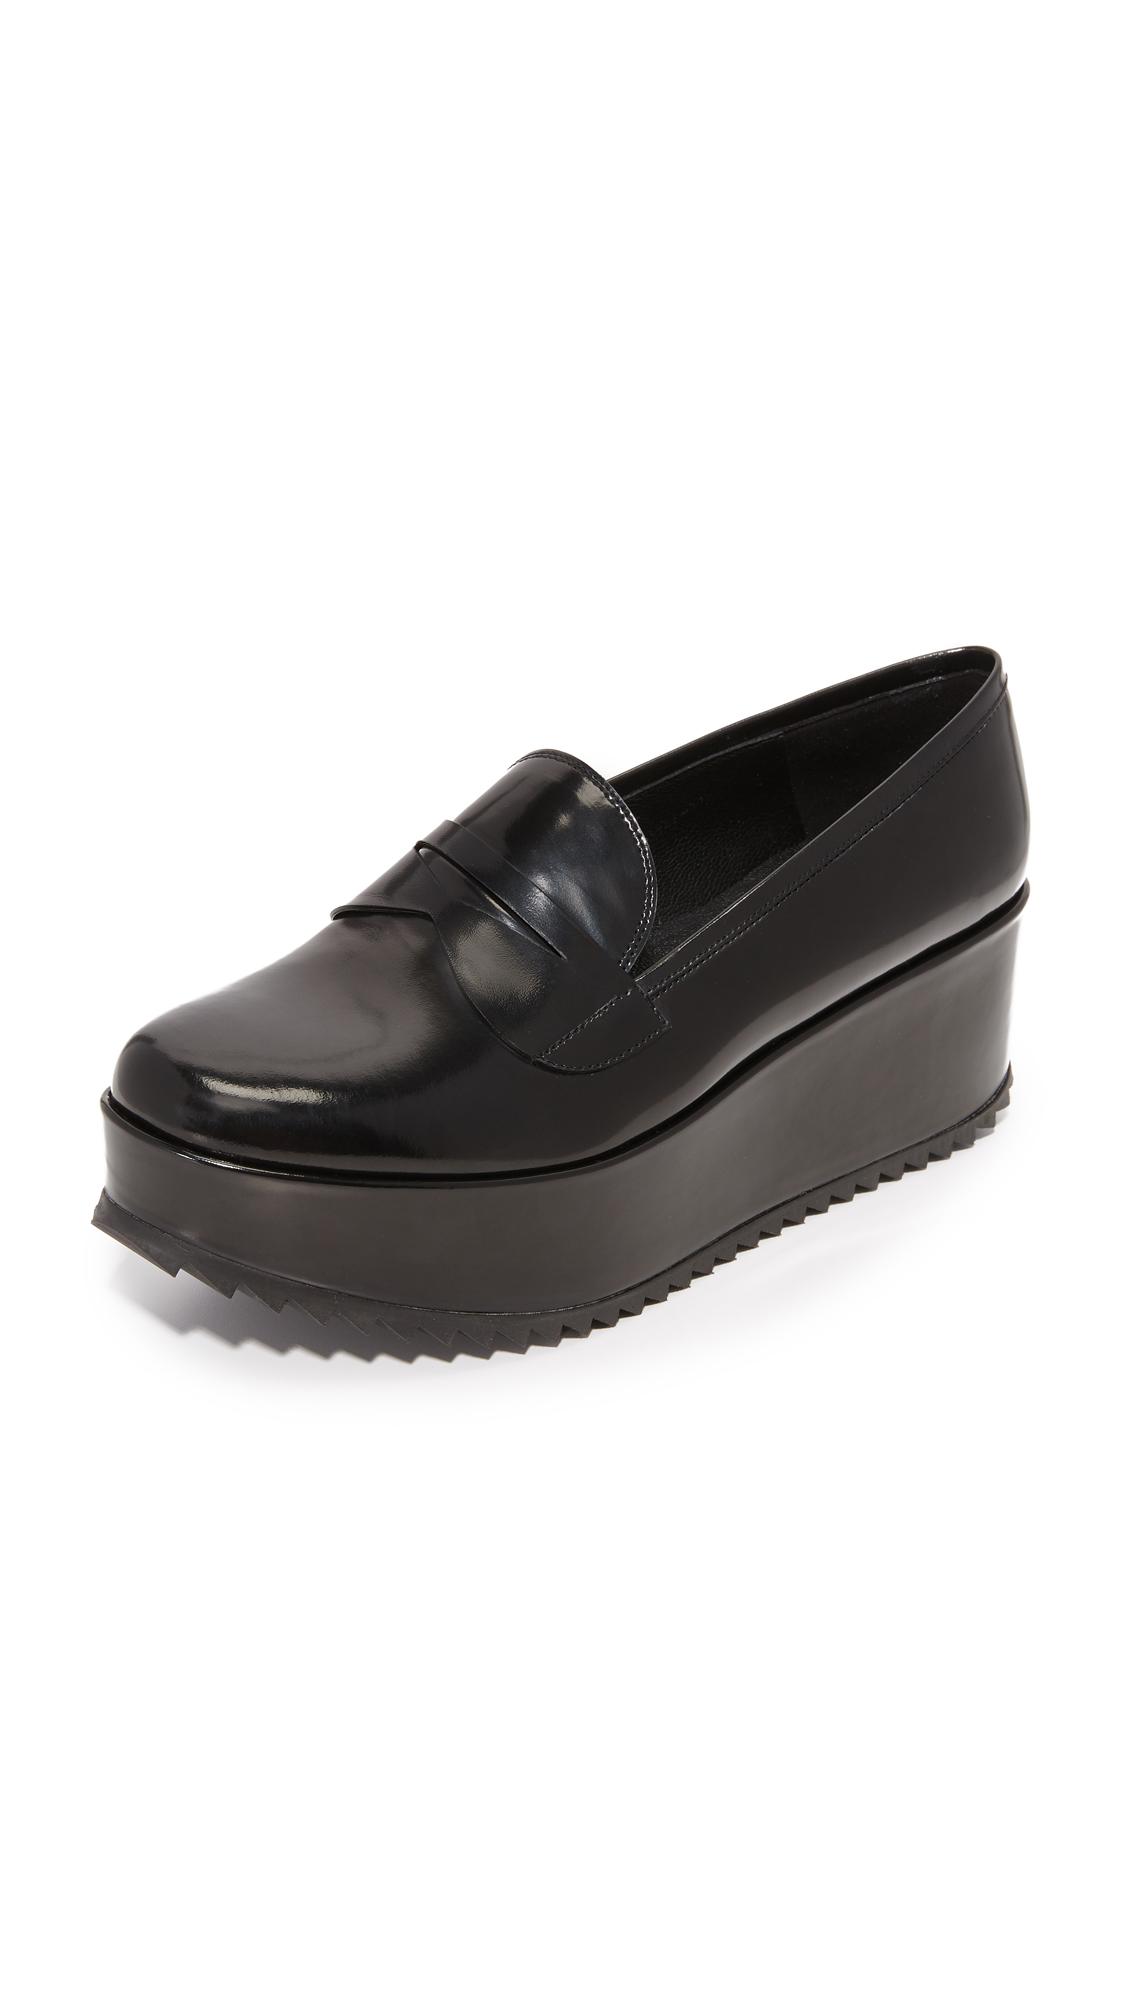 Pedro Garcia Norberta Platform Loafers - Black